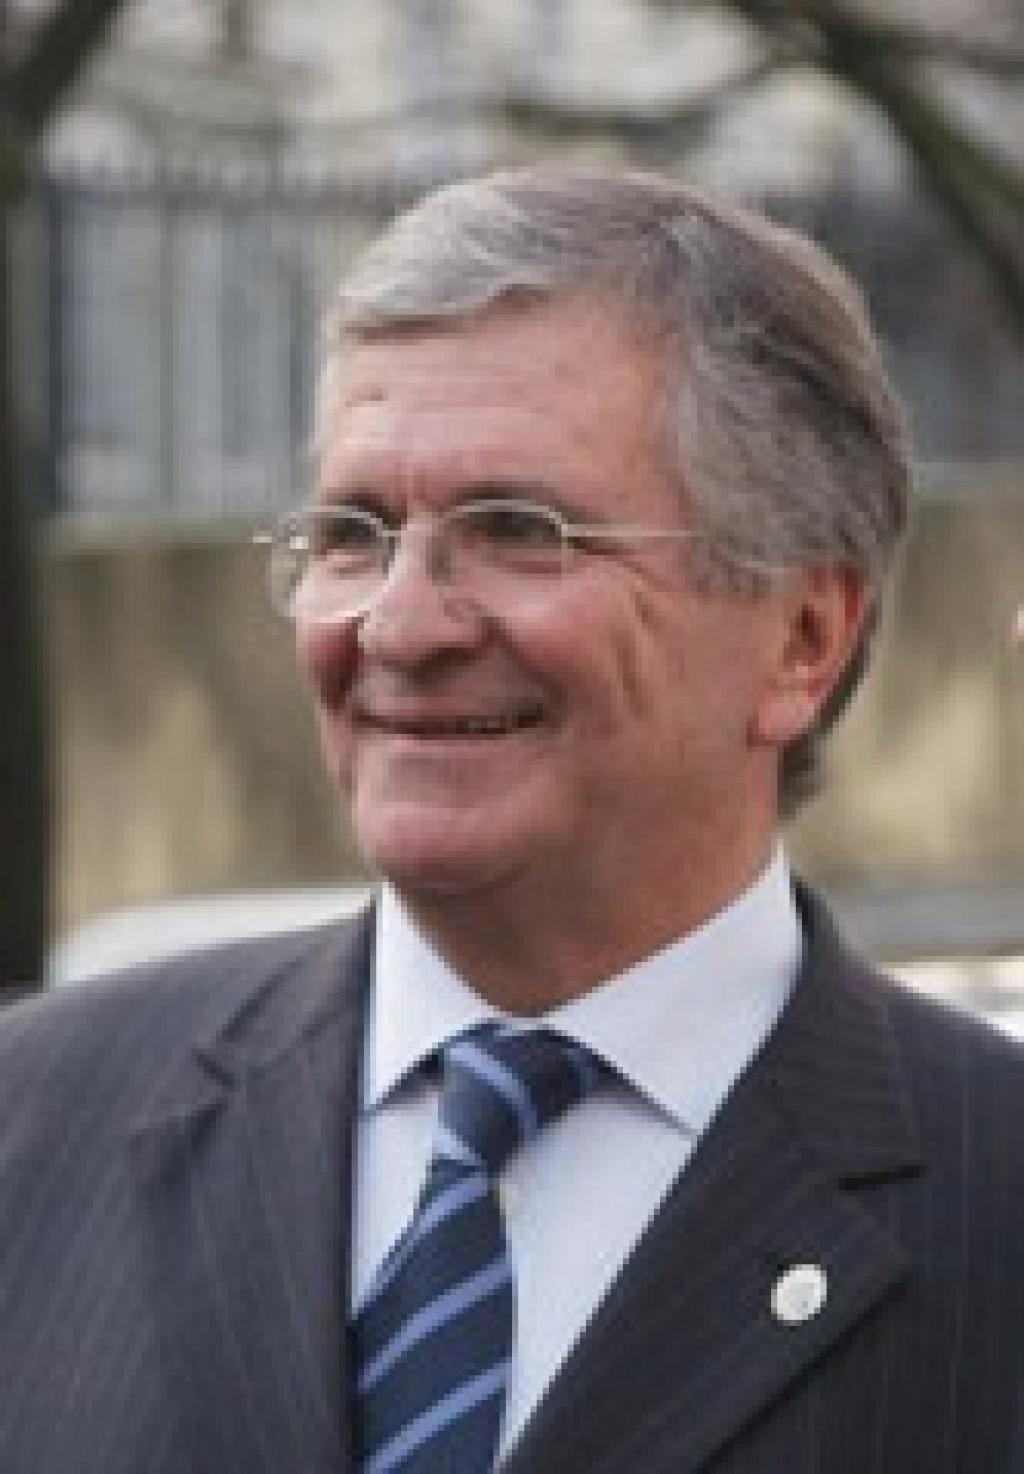 José Manuel Costa e Oliveira new Judo President of Portugal